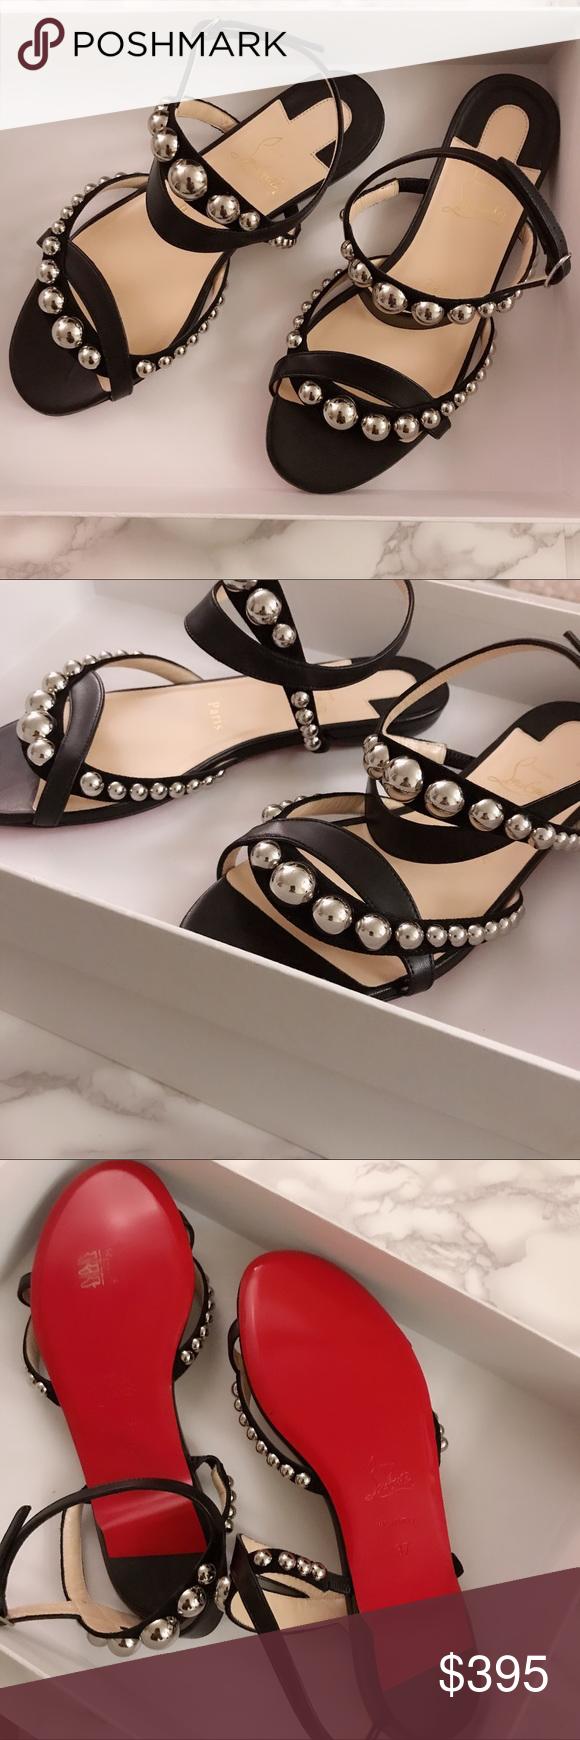 5c995832f95 Christian Louboutin Galleria Flat Napa Christian Louboutin sandal in napa  leather and calf suede